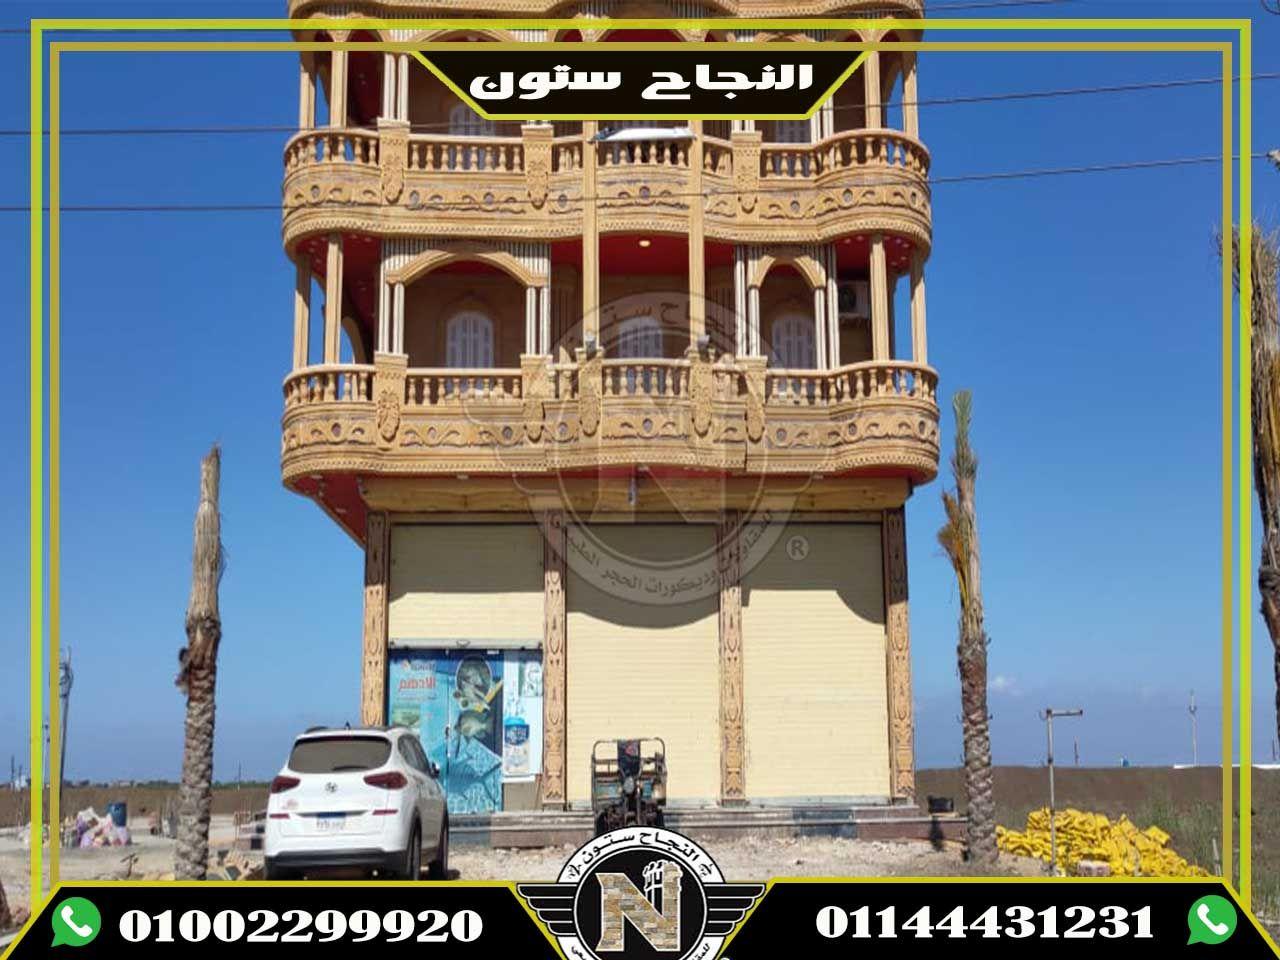 اسعار الحجر الهاشمي فى مصر 2020 House Styles Mansions Home Decor